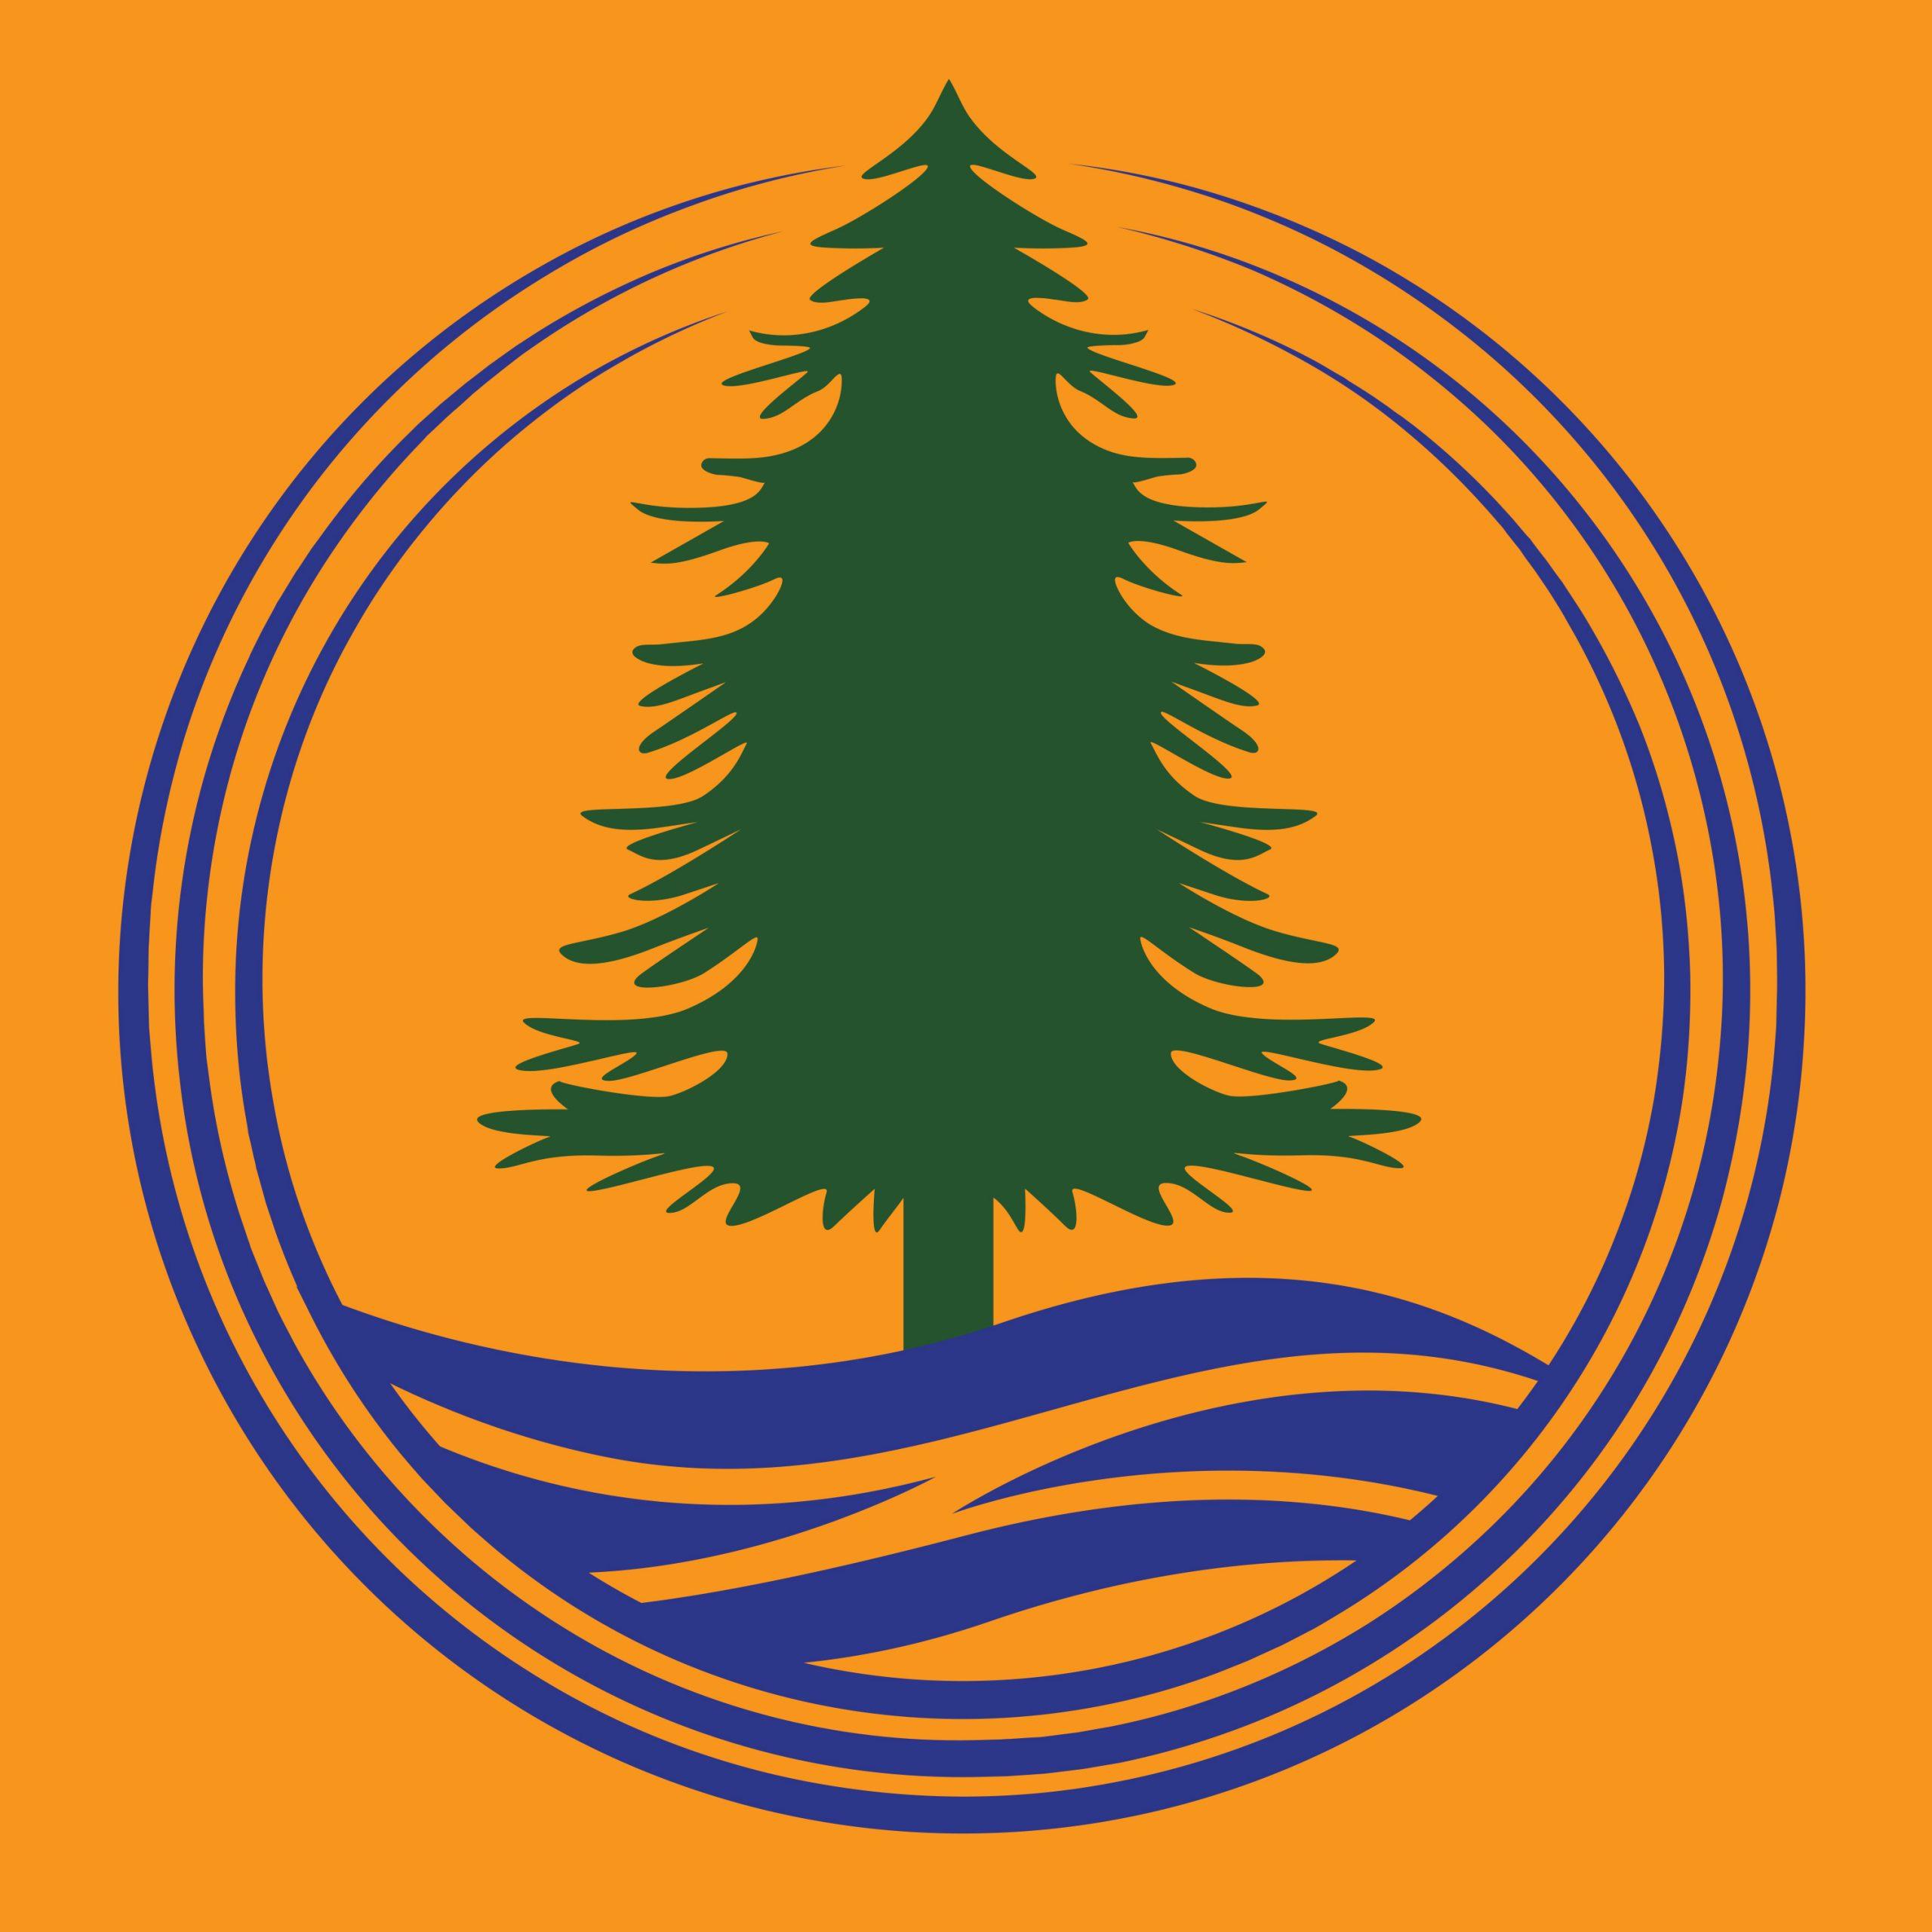 ABPT 2021 Square design logo colour